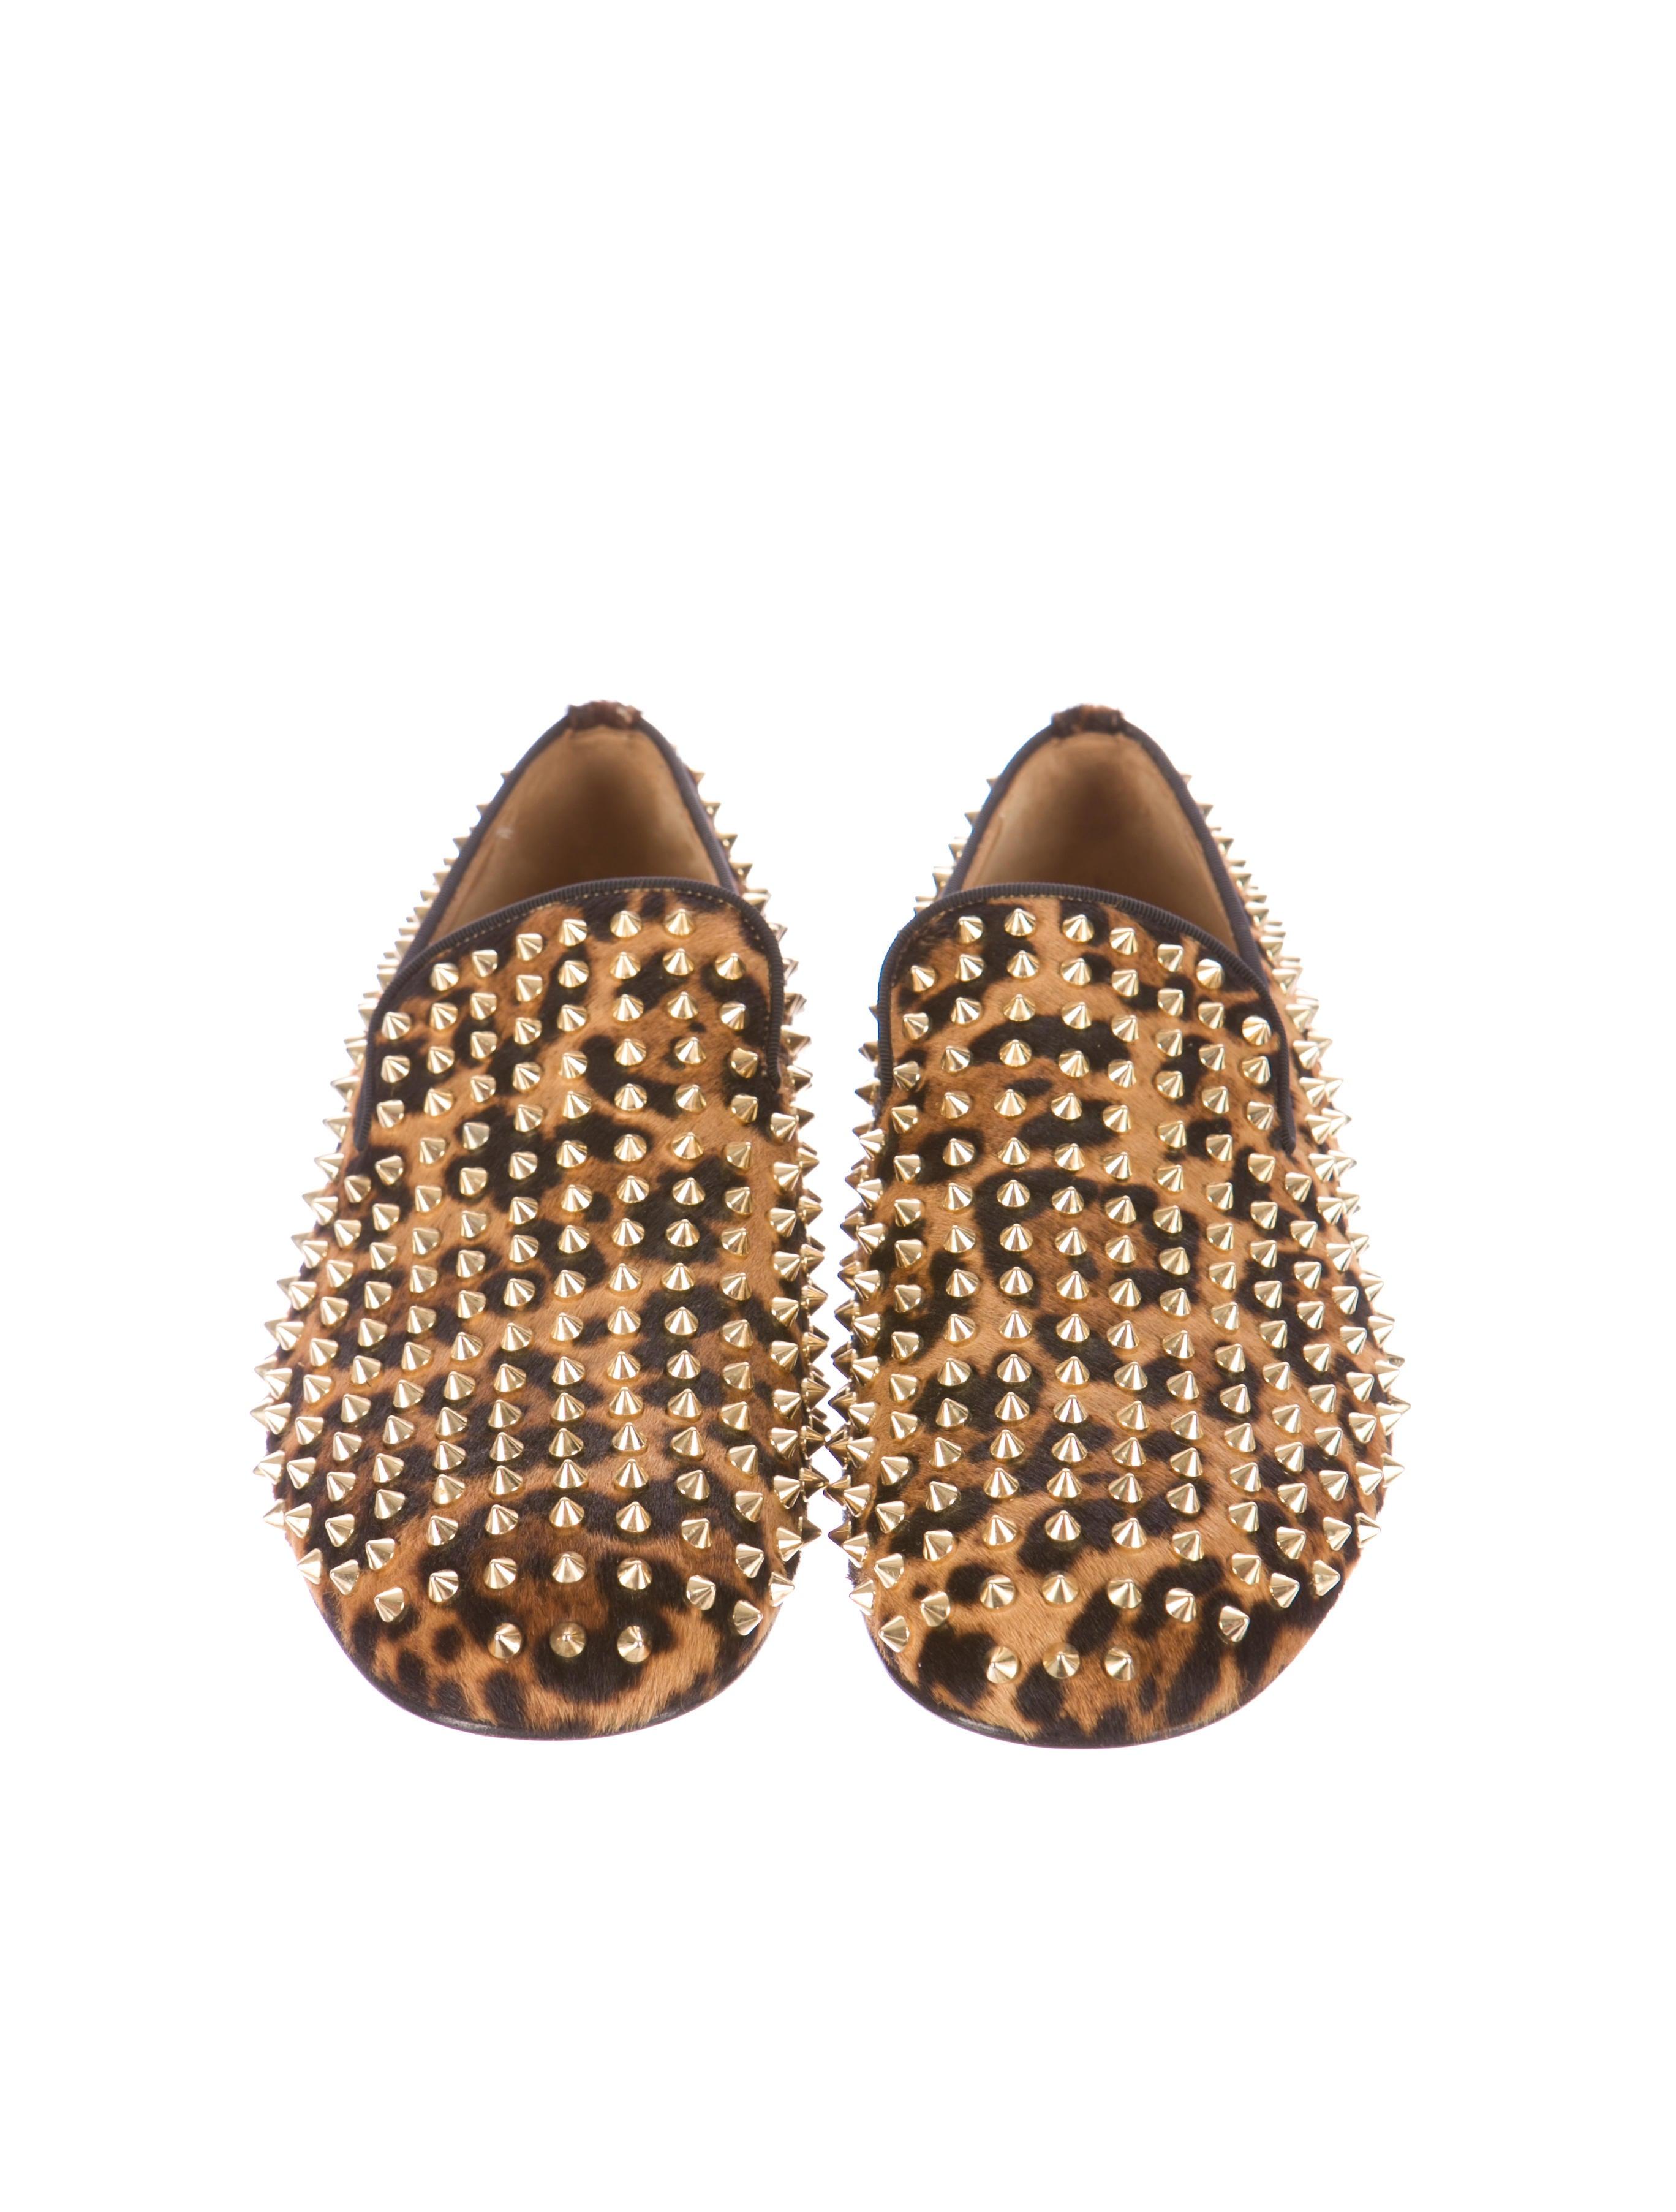 Christian Louboutin Dandelion Smoking Slippers - Mens Shoes ...